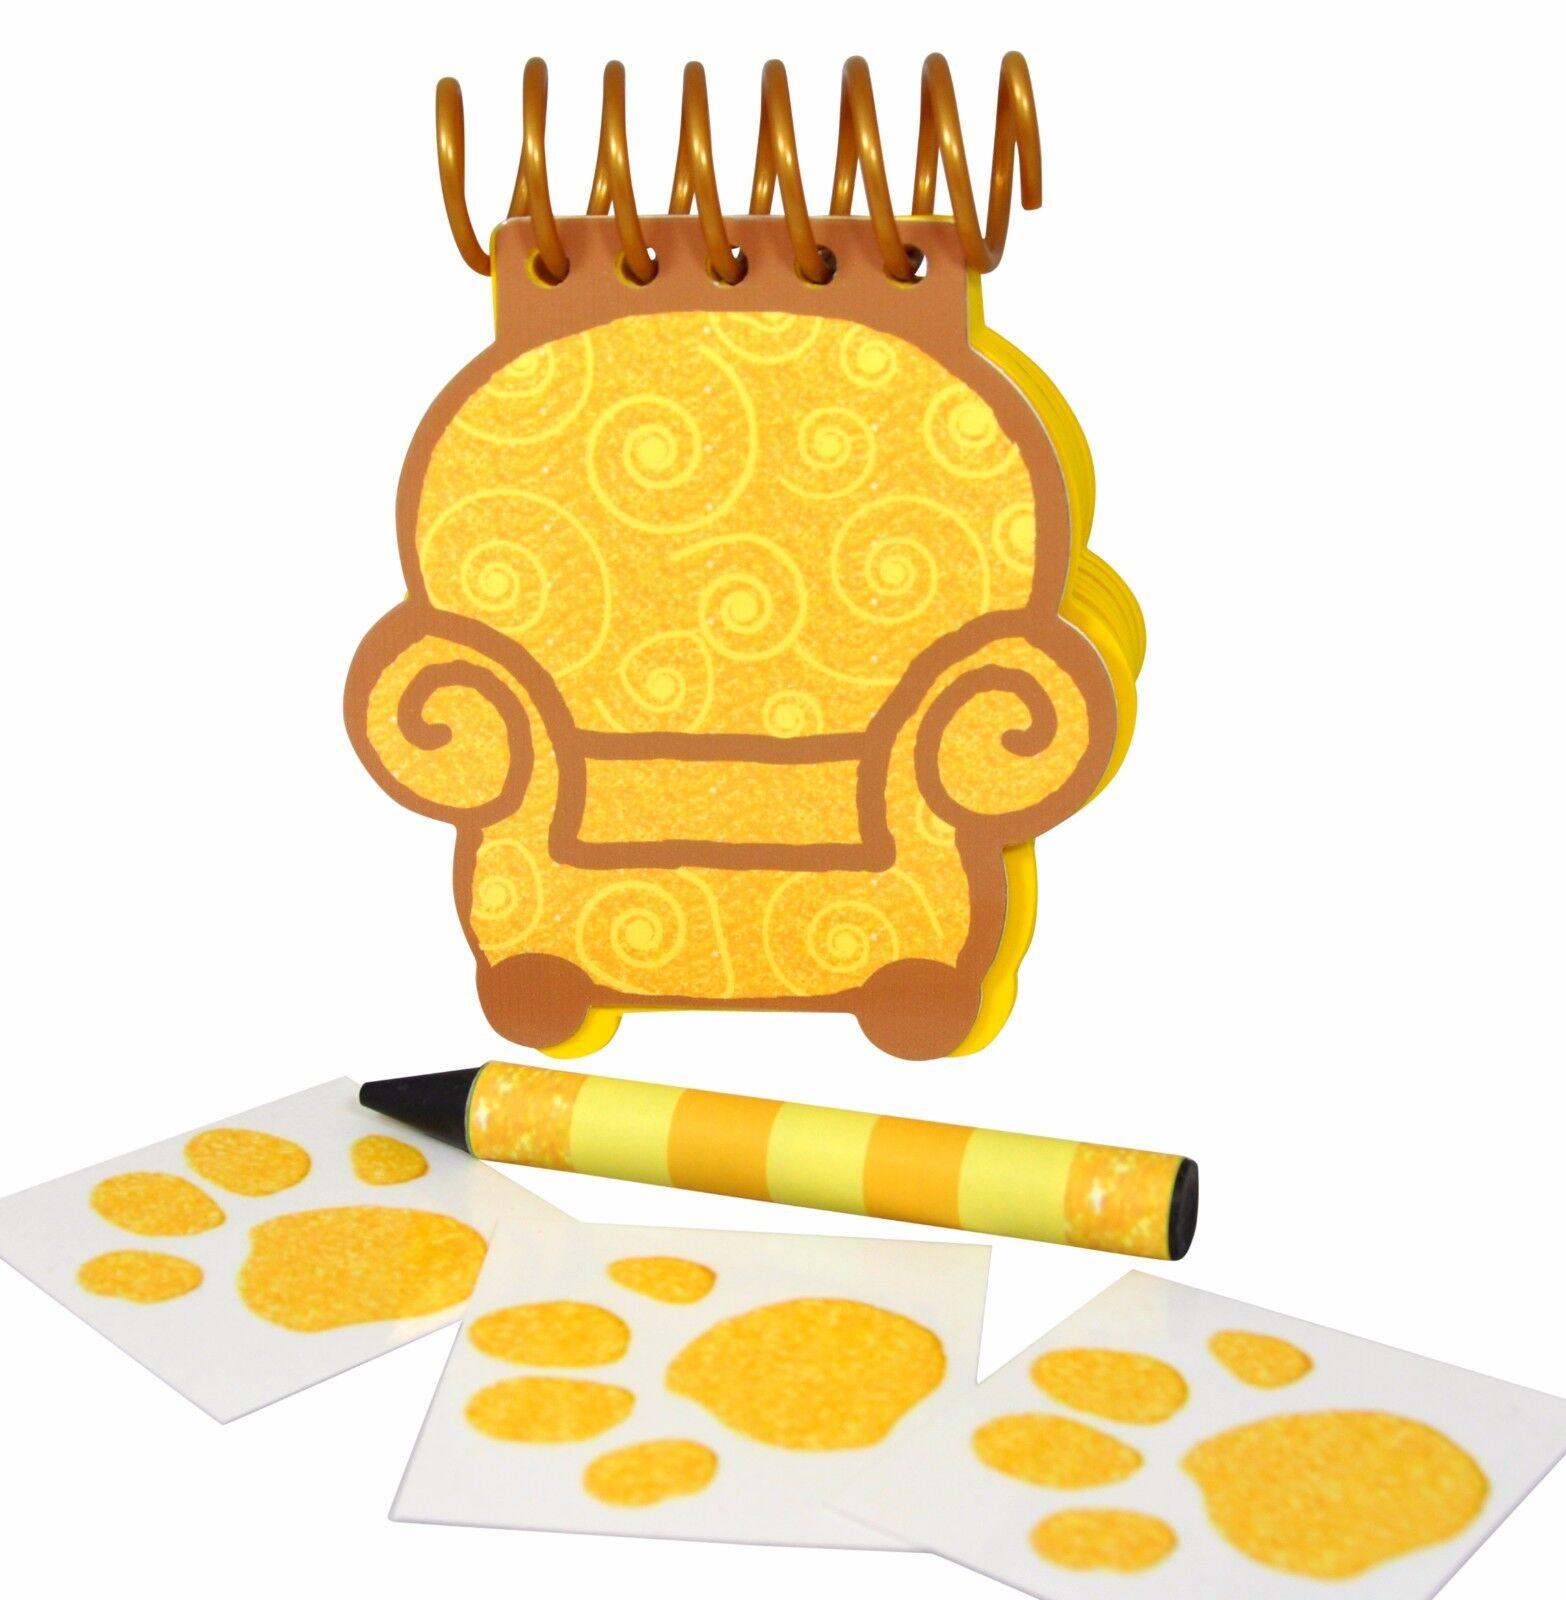 Handcrafted Handy Dandy Notebook Inspired Notebook Golden